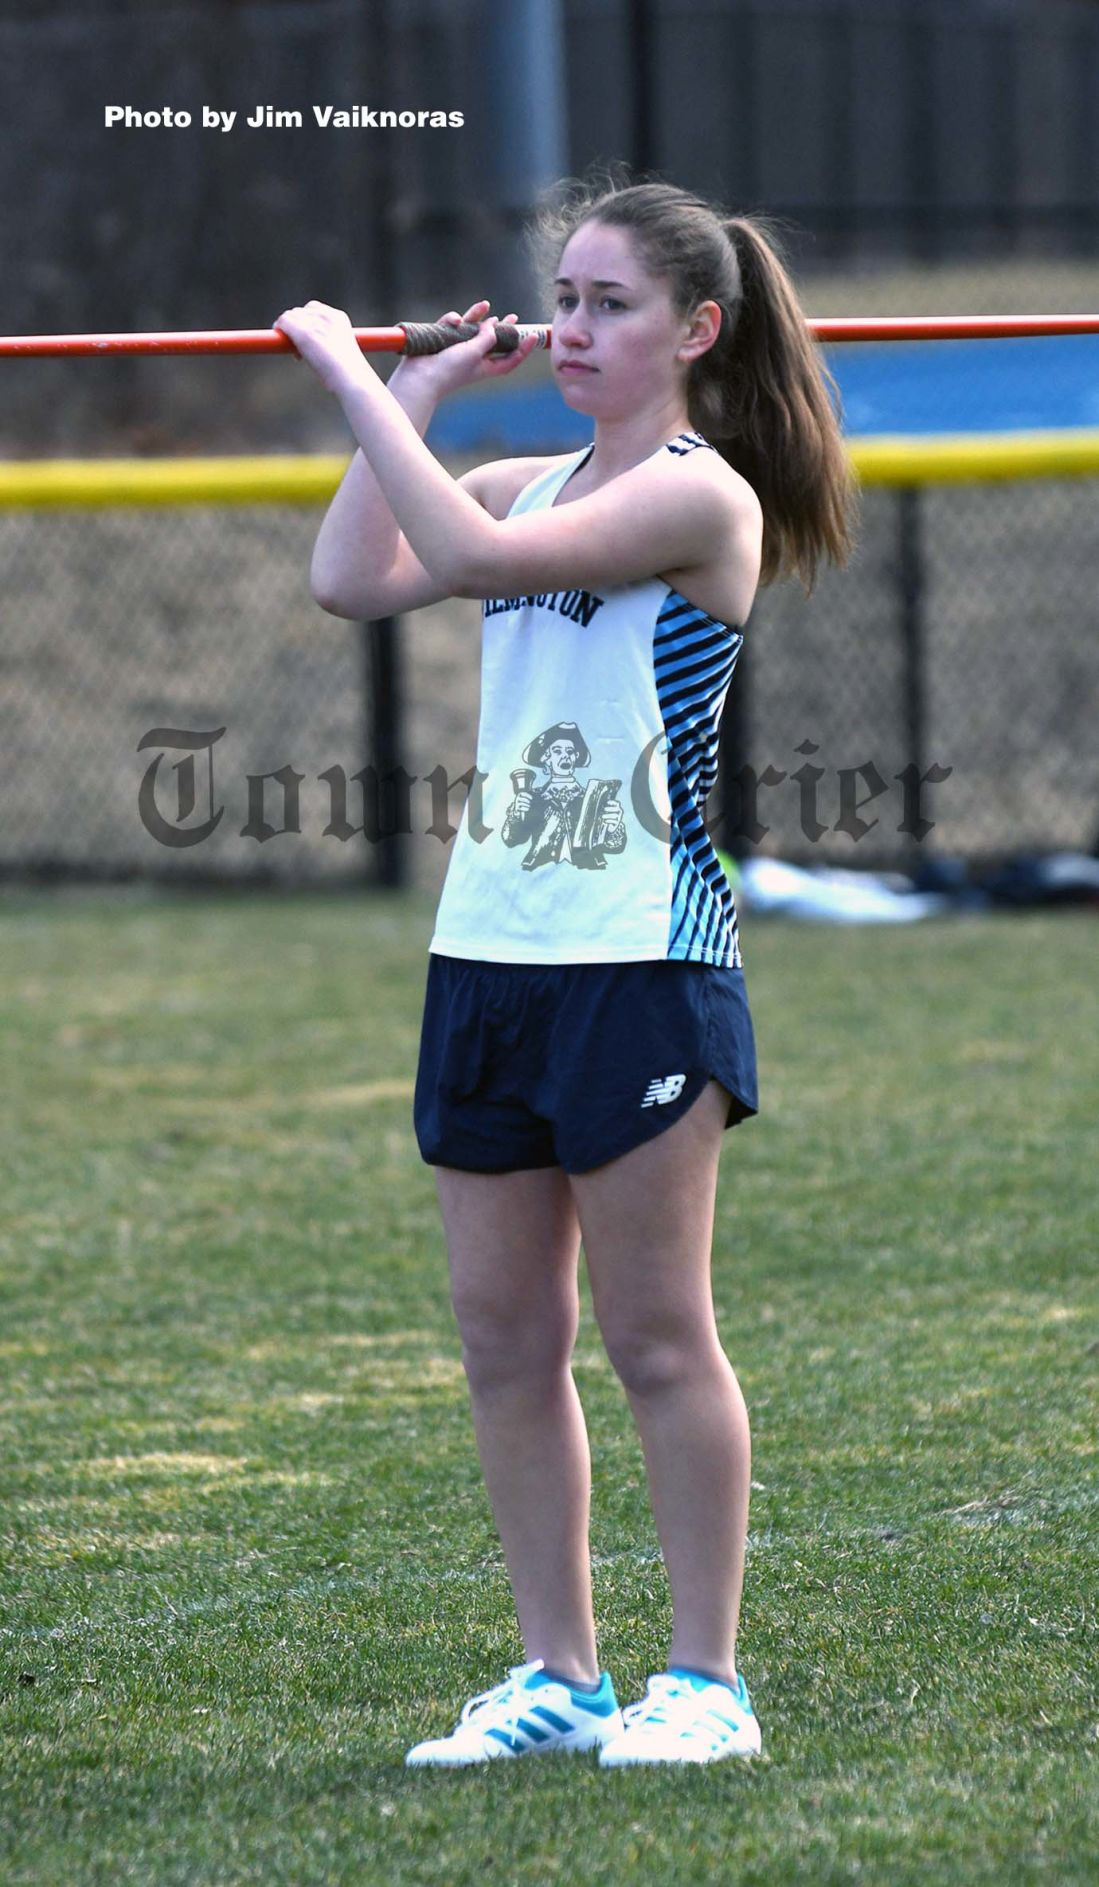 Wilmington's Gabby Villalta waits to throw the javelin